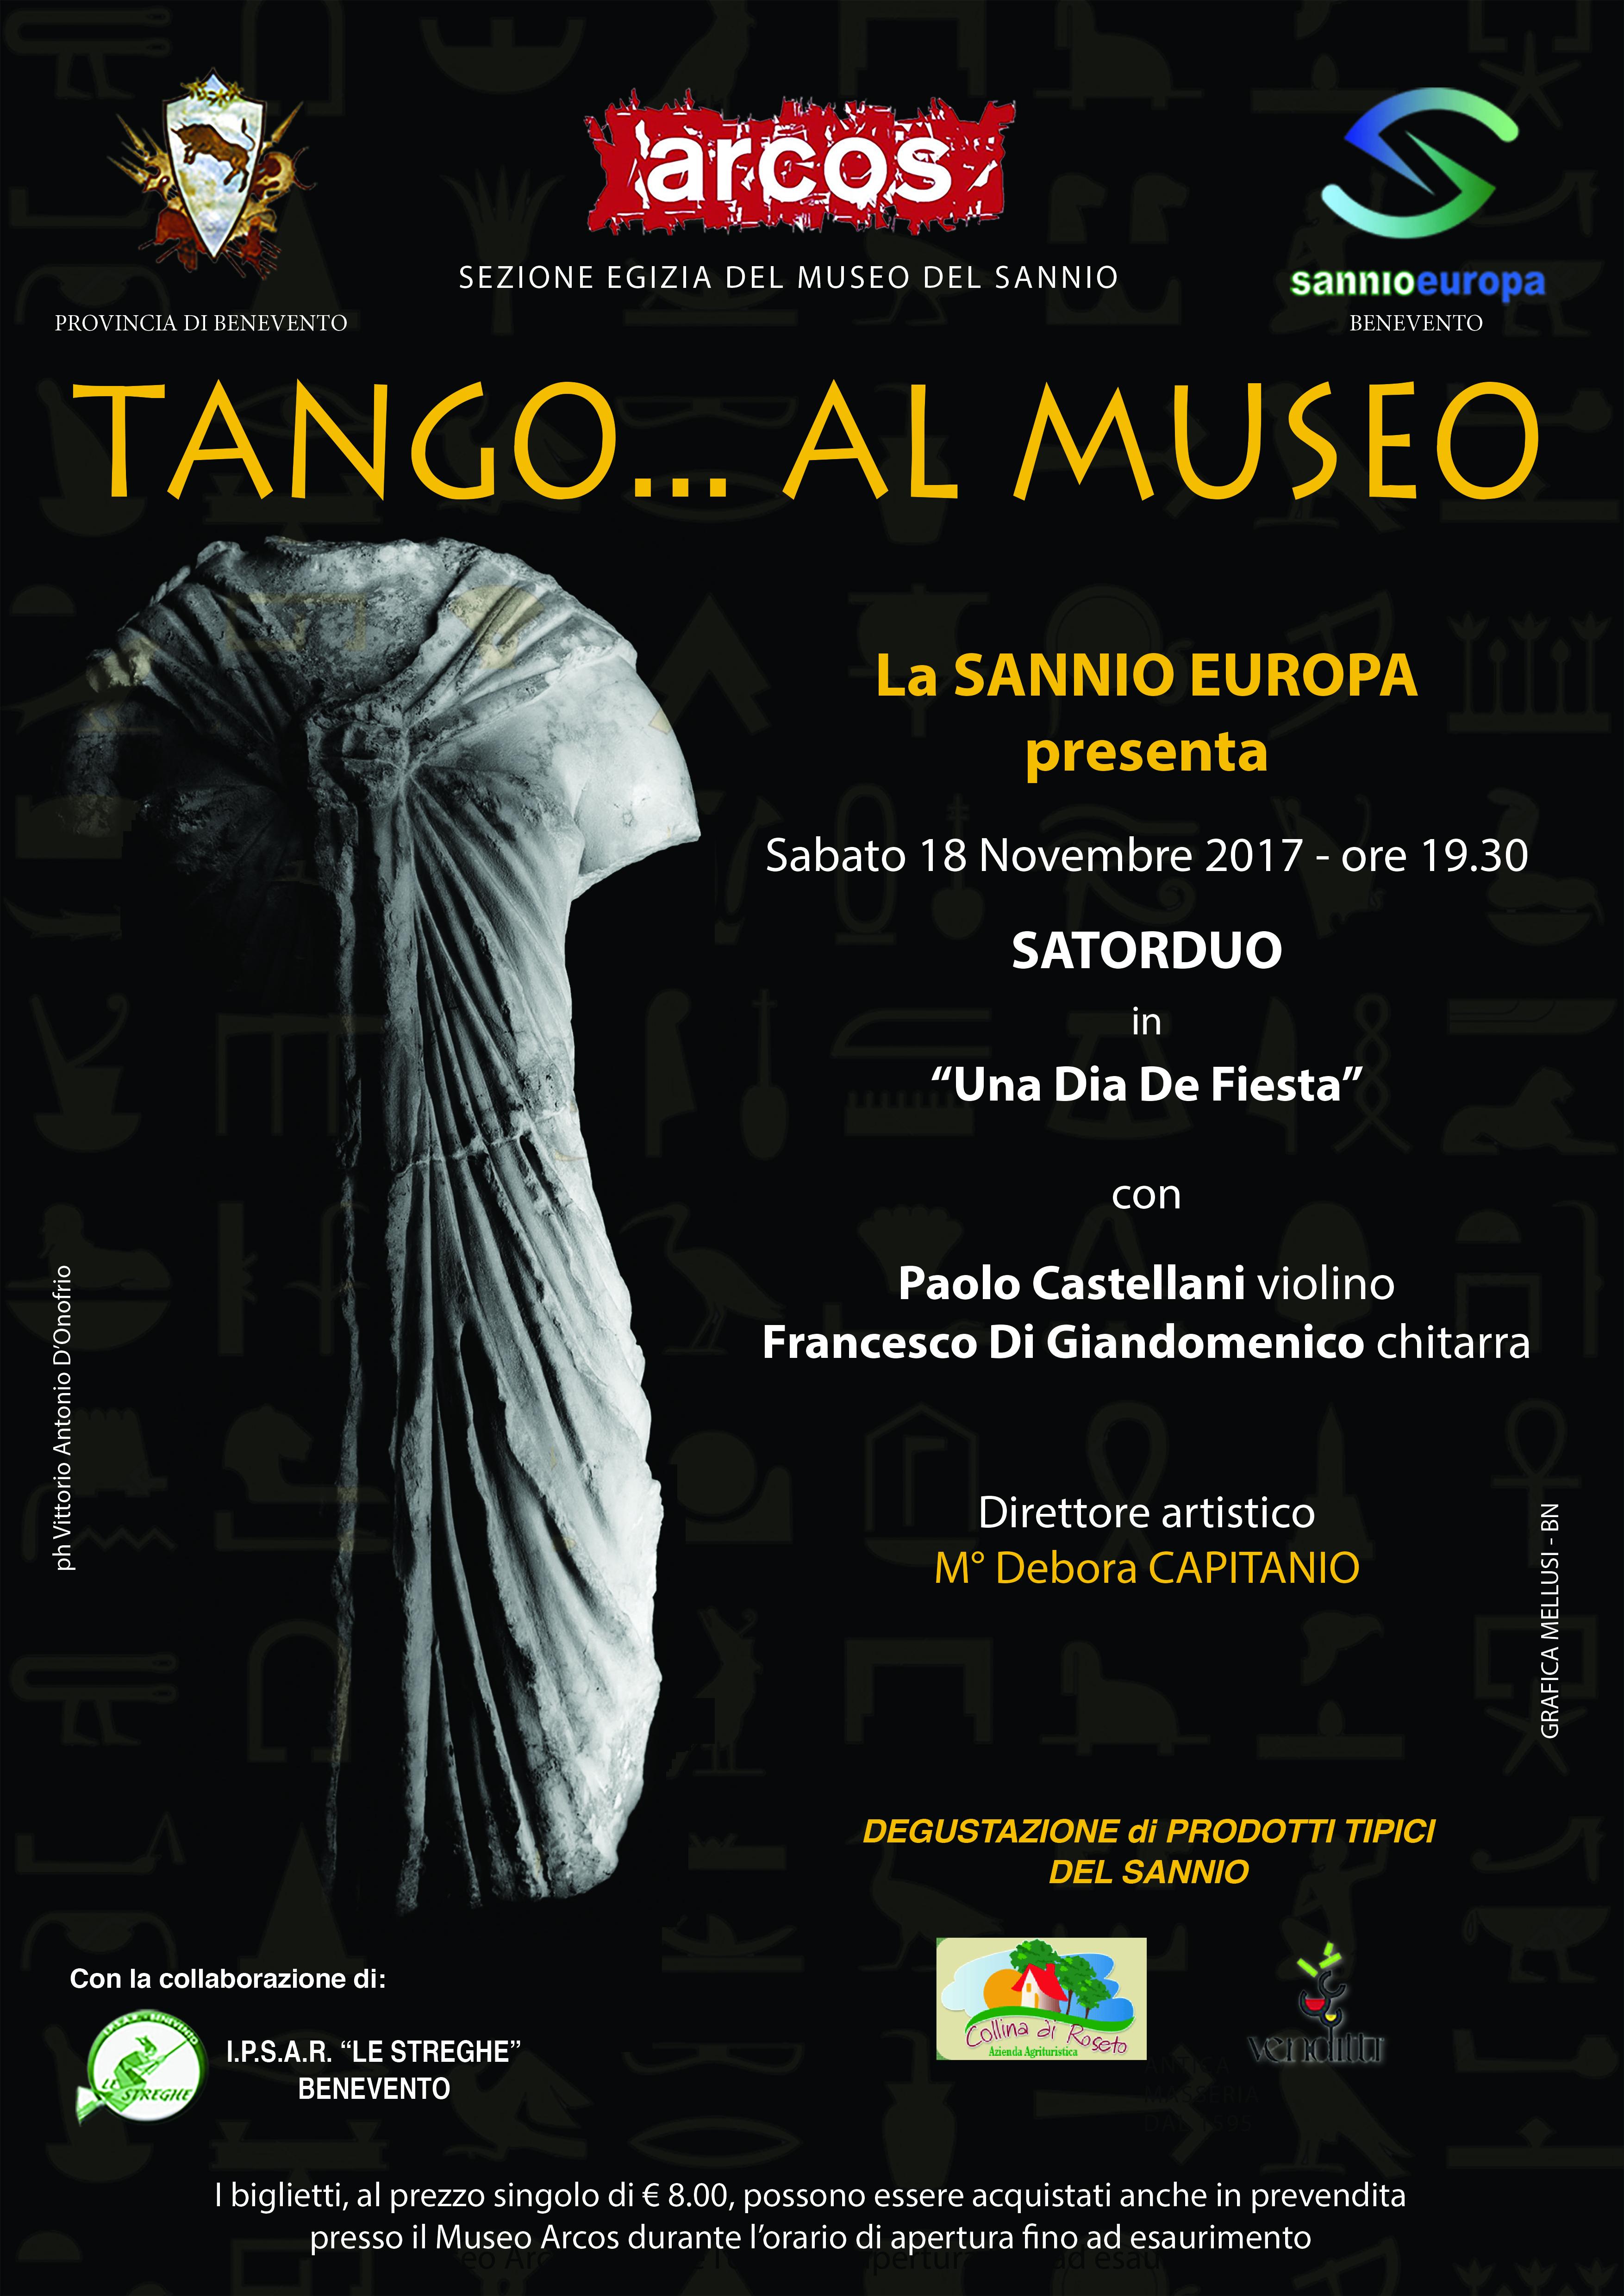 Sabato all'Arcos serata dedicata al tango con gli 'Satorduo'